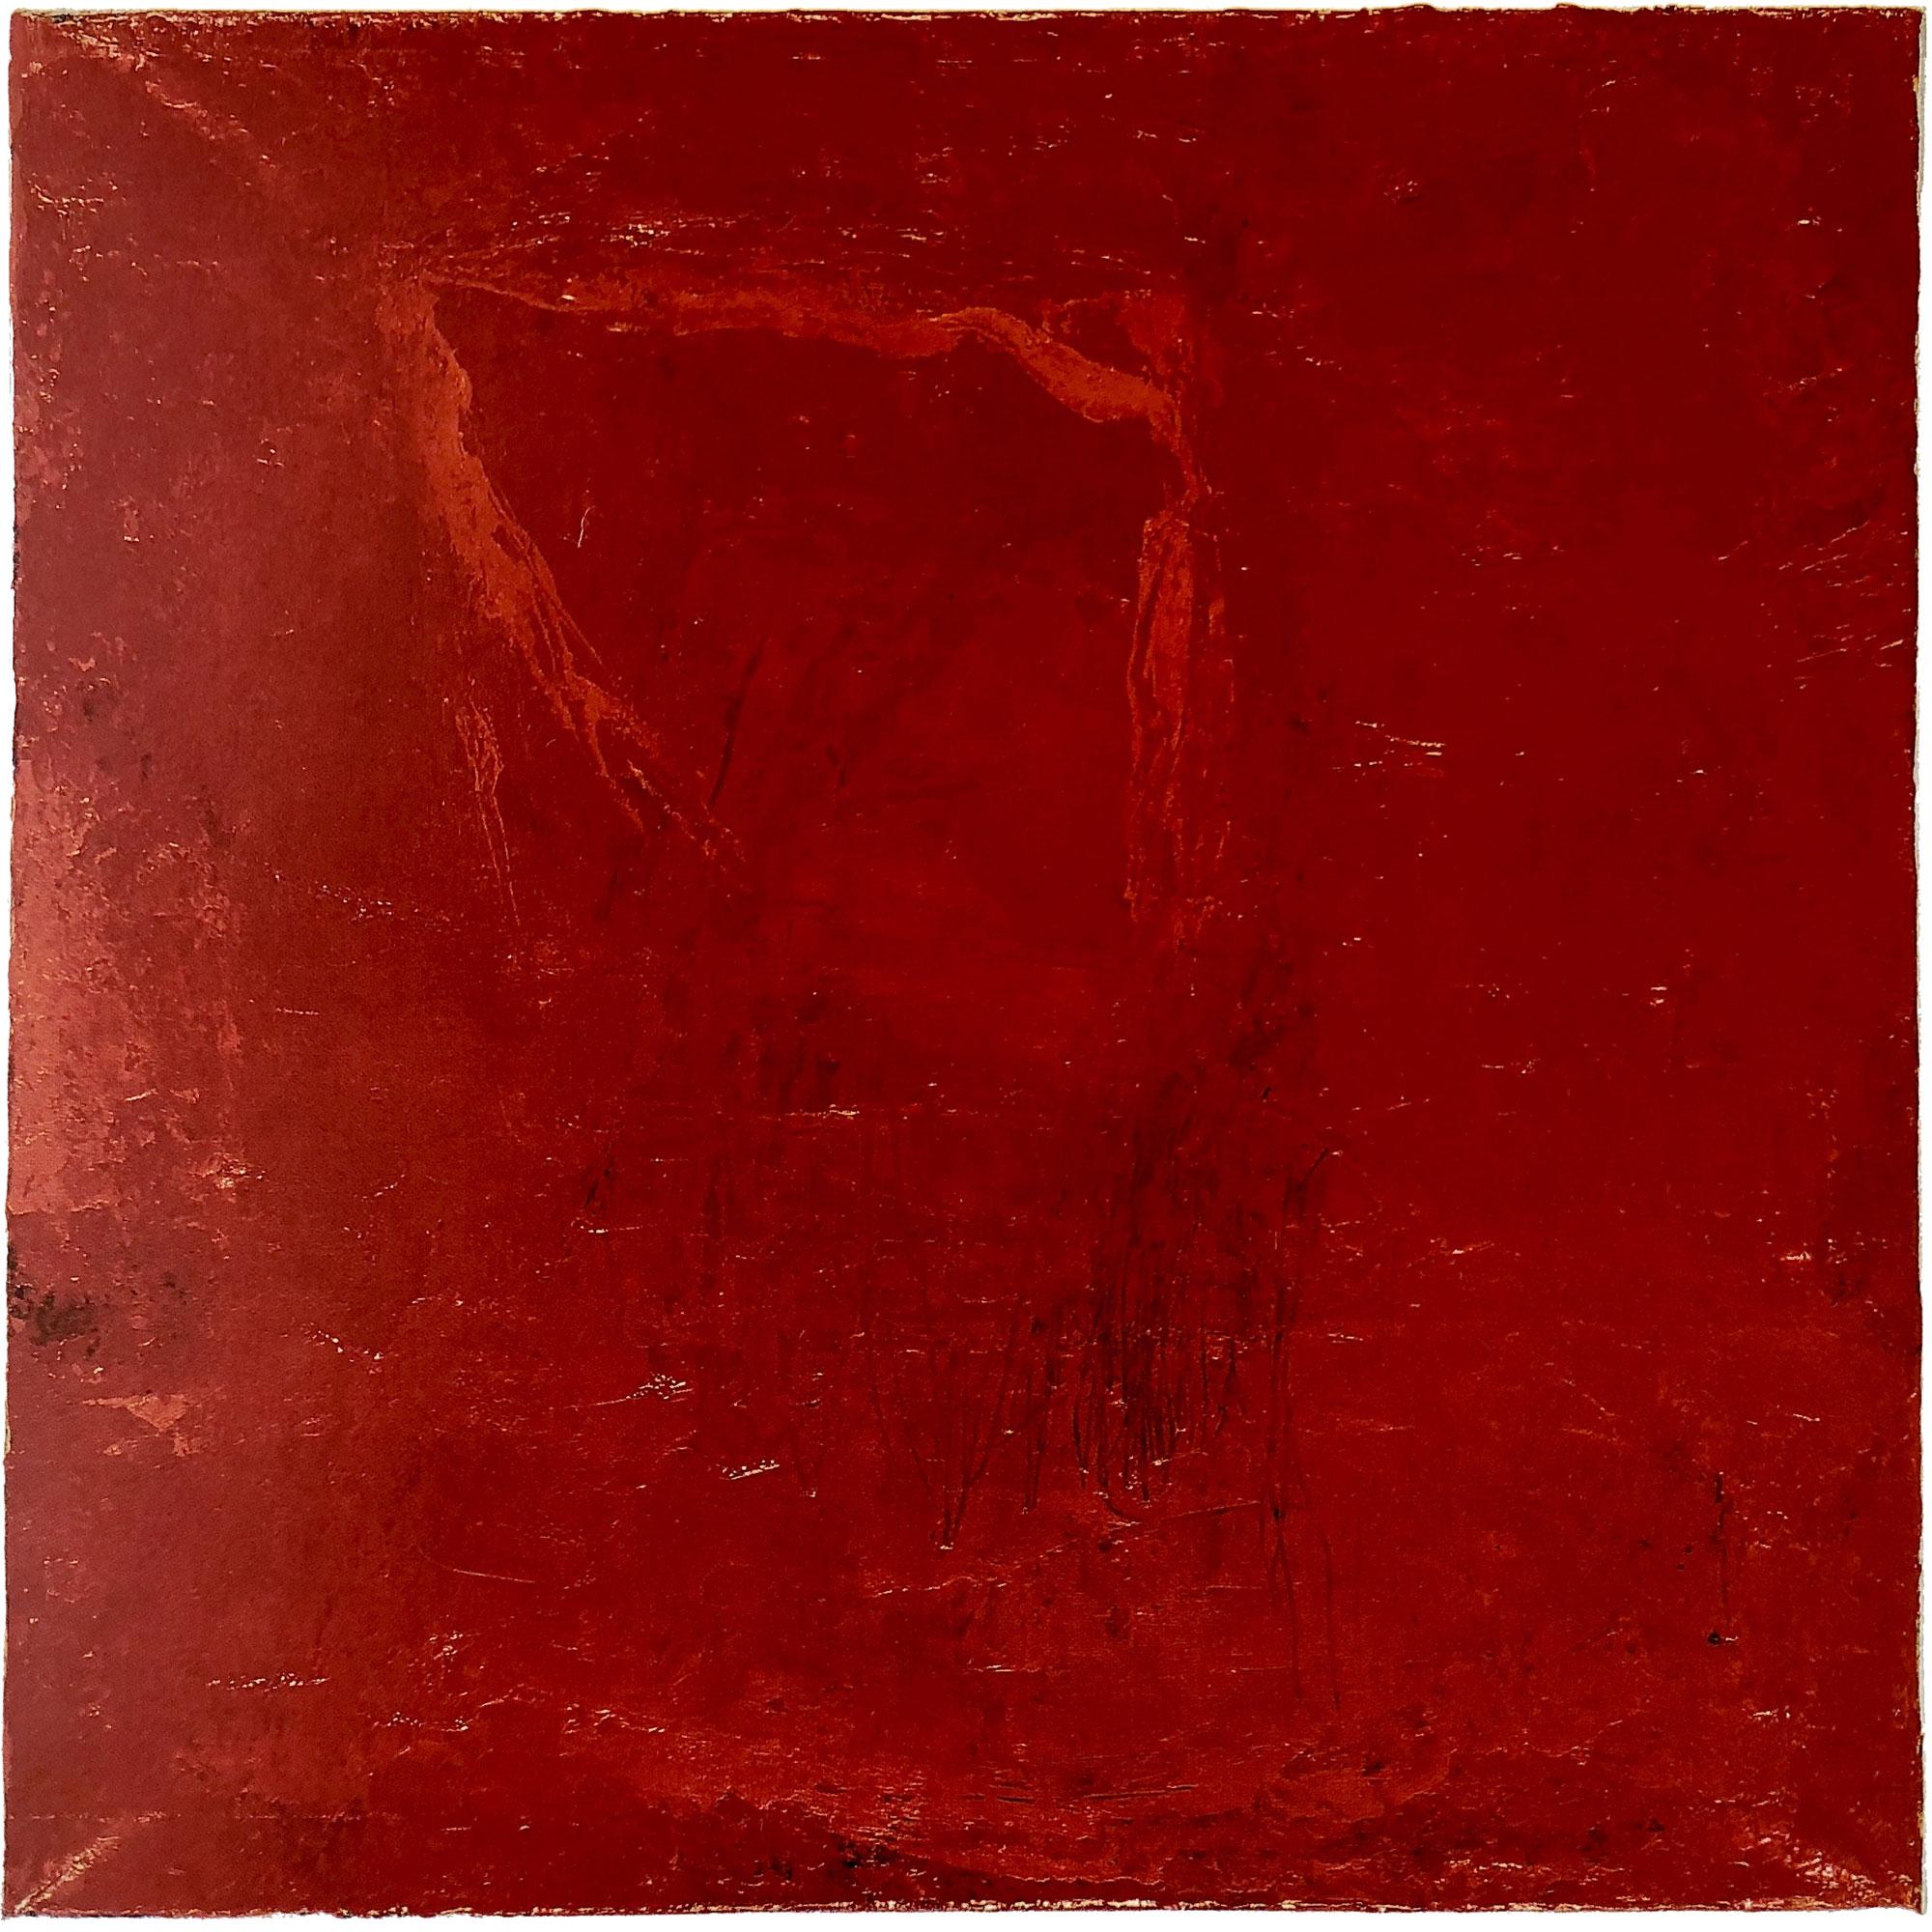 Monochrom-ohne-Titel-5-Öl-auf-Leinwand-60×60-1995